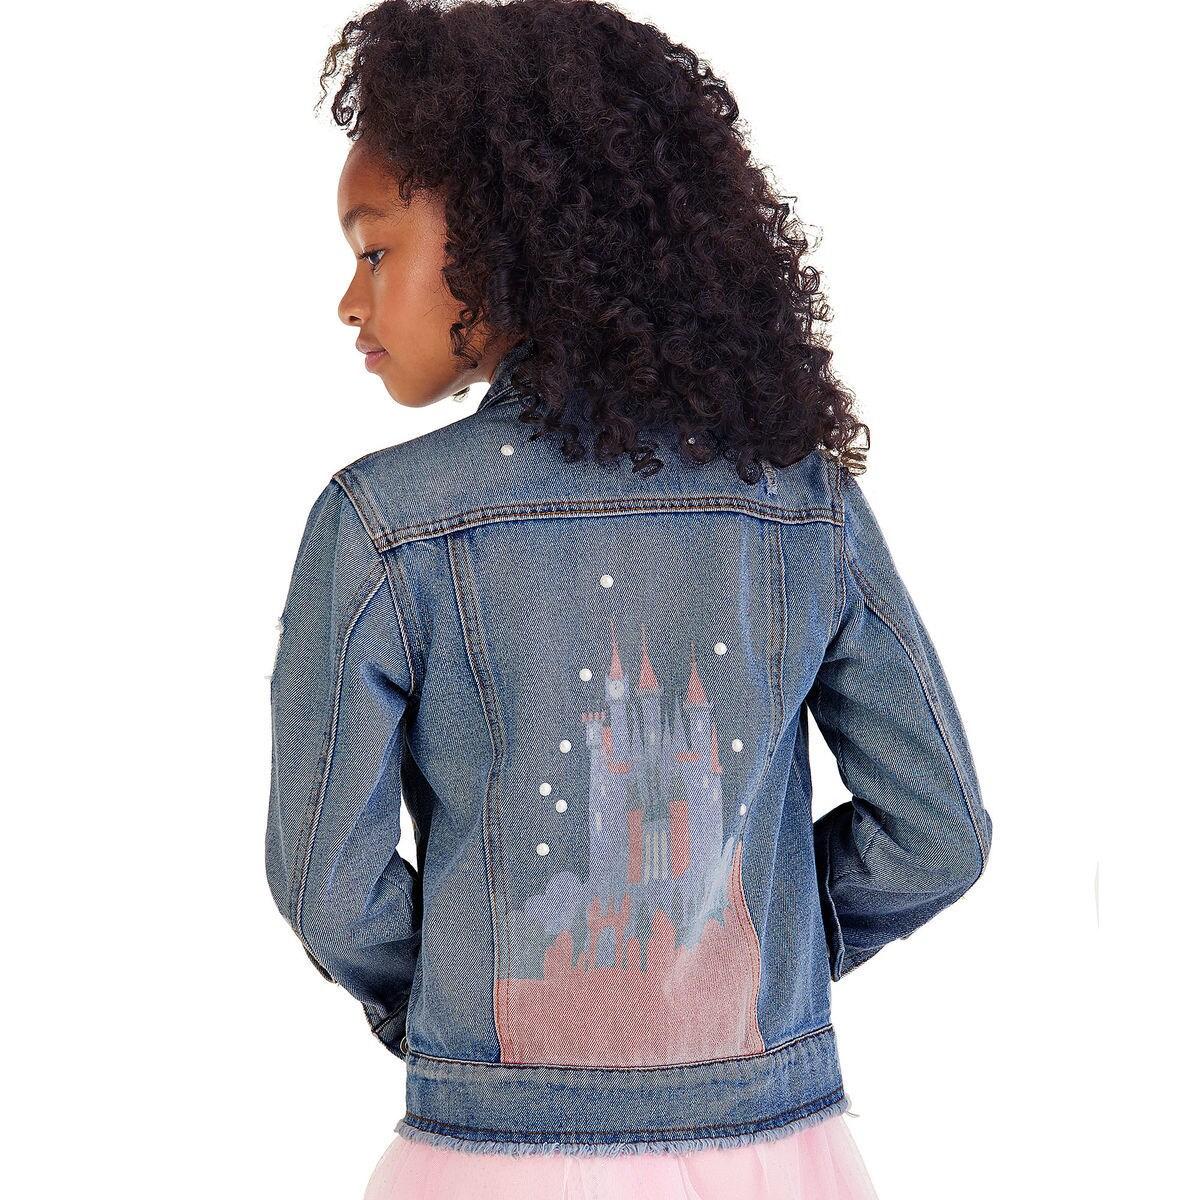 Cinderella Denim Jacket For Girls Shopdisney